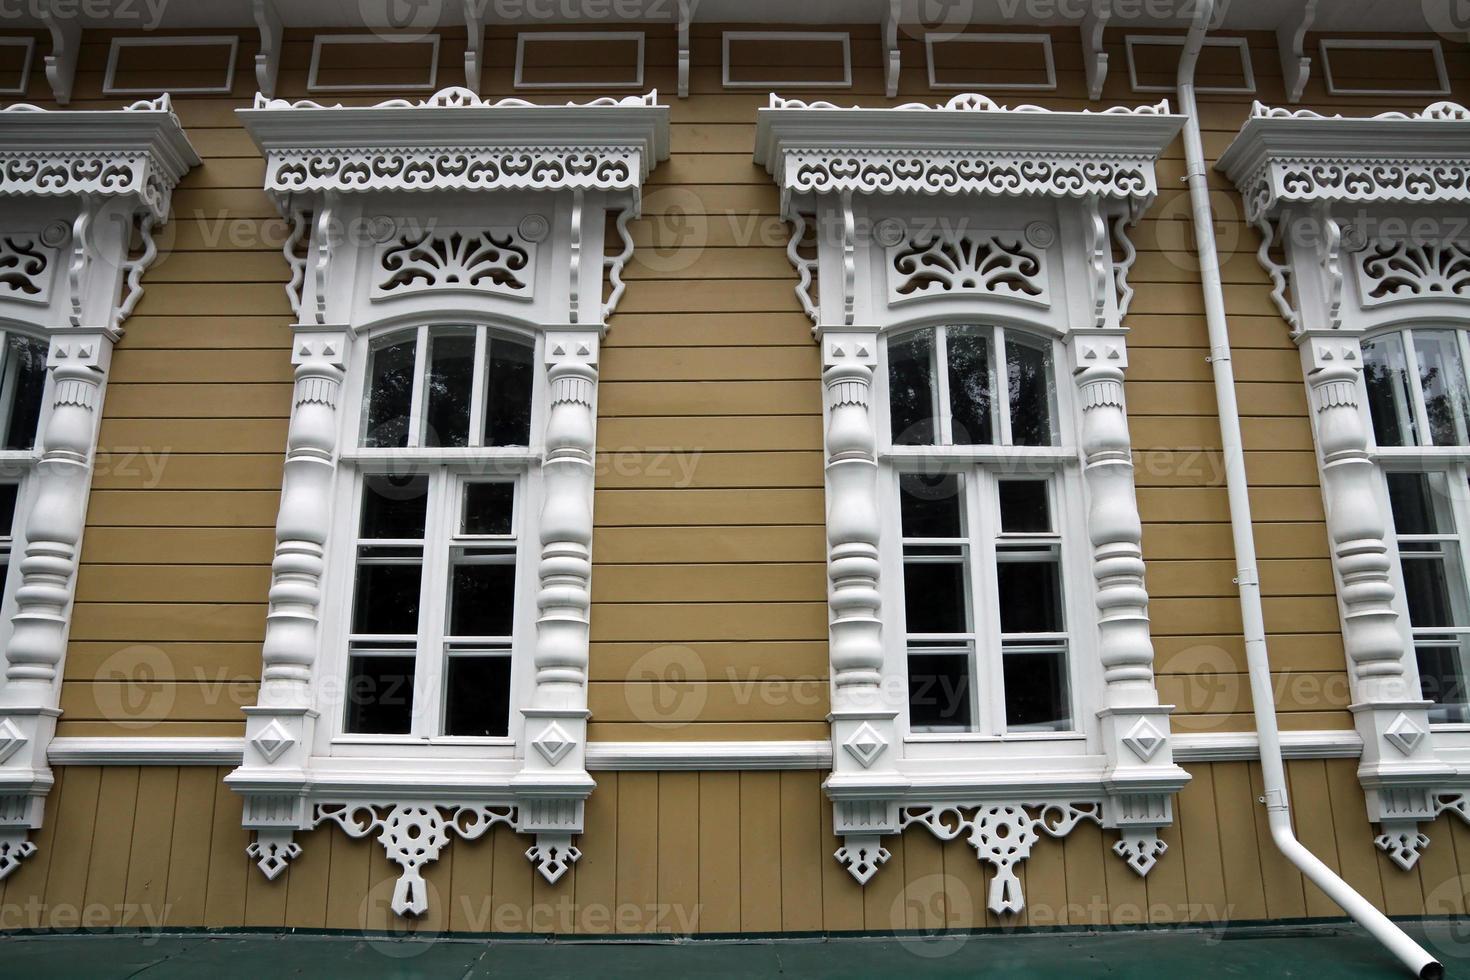 ventanas con arquitrabes foto